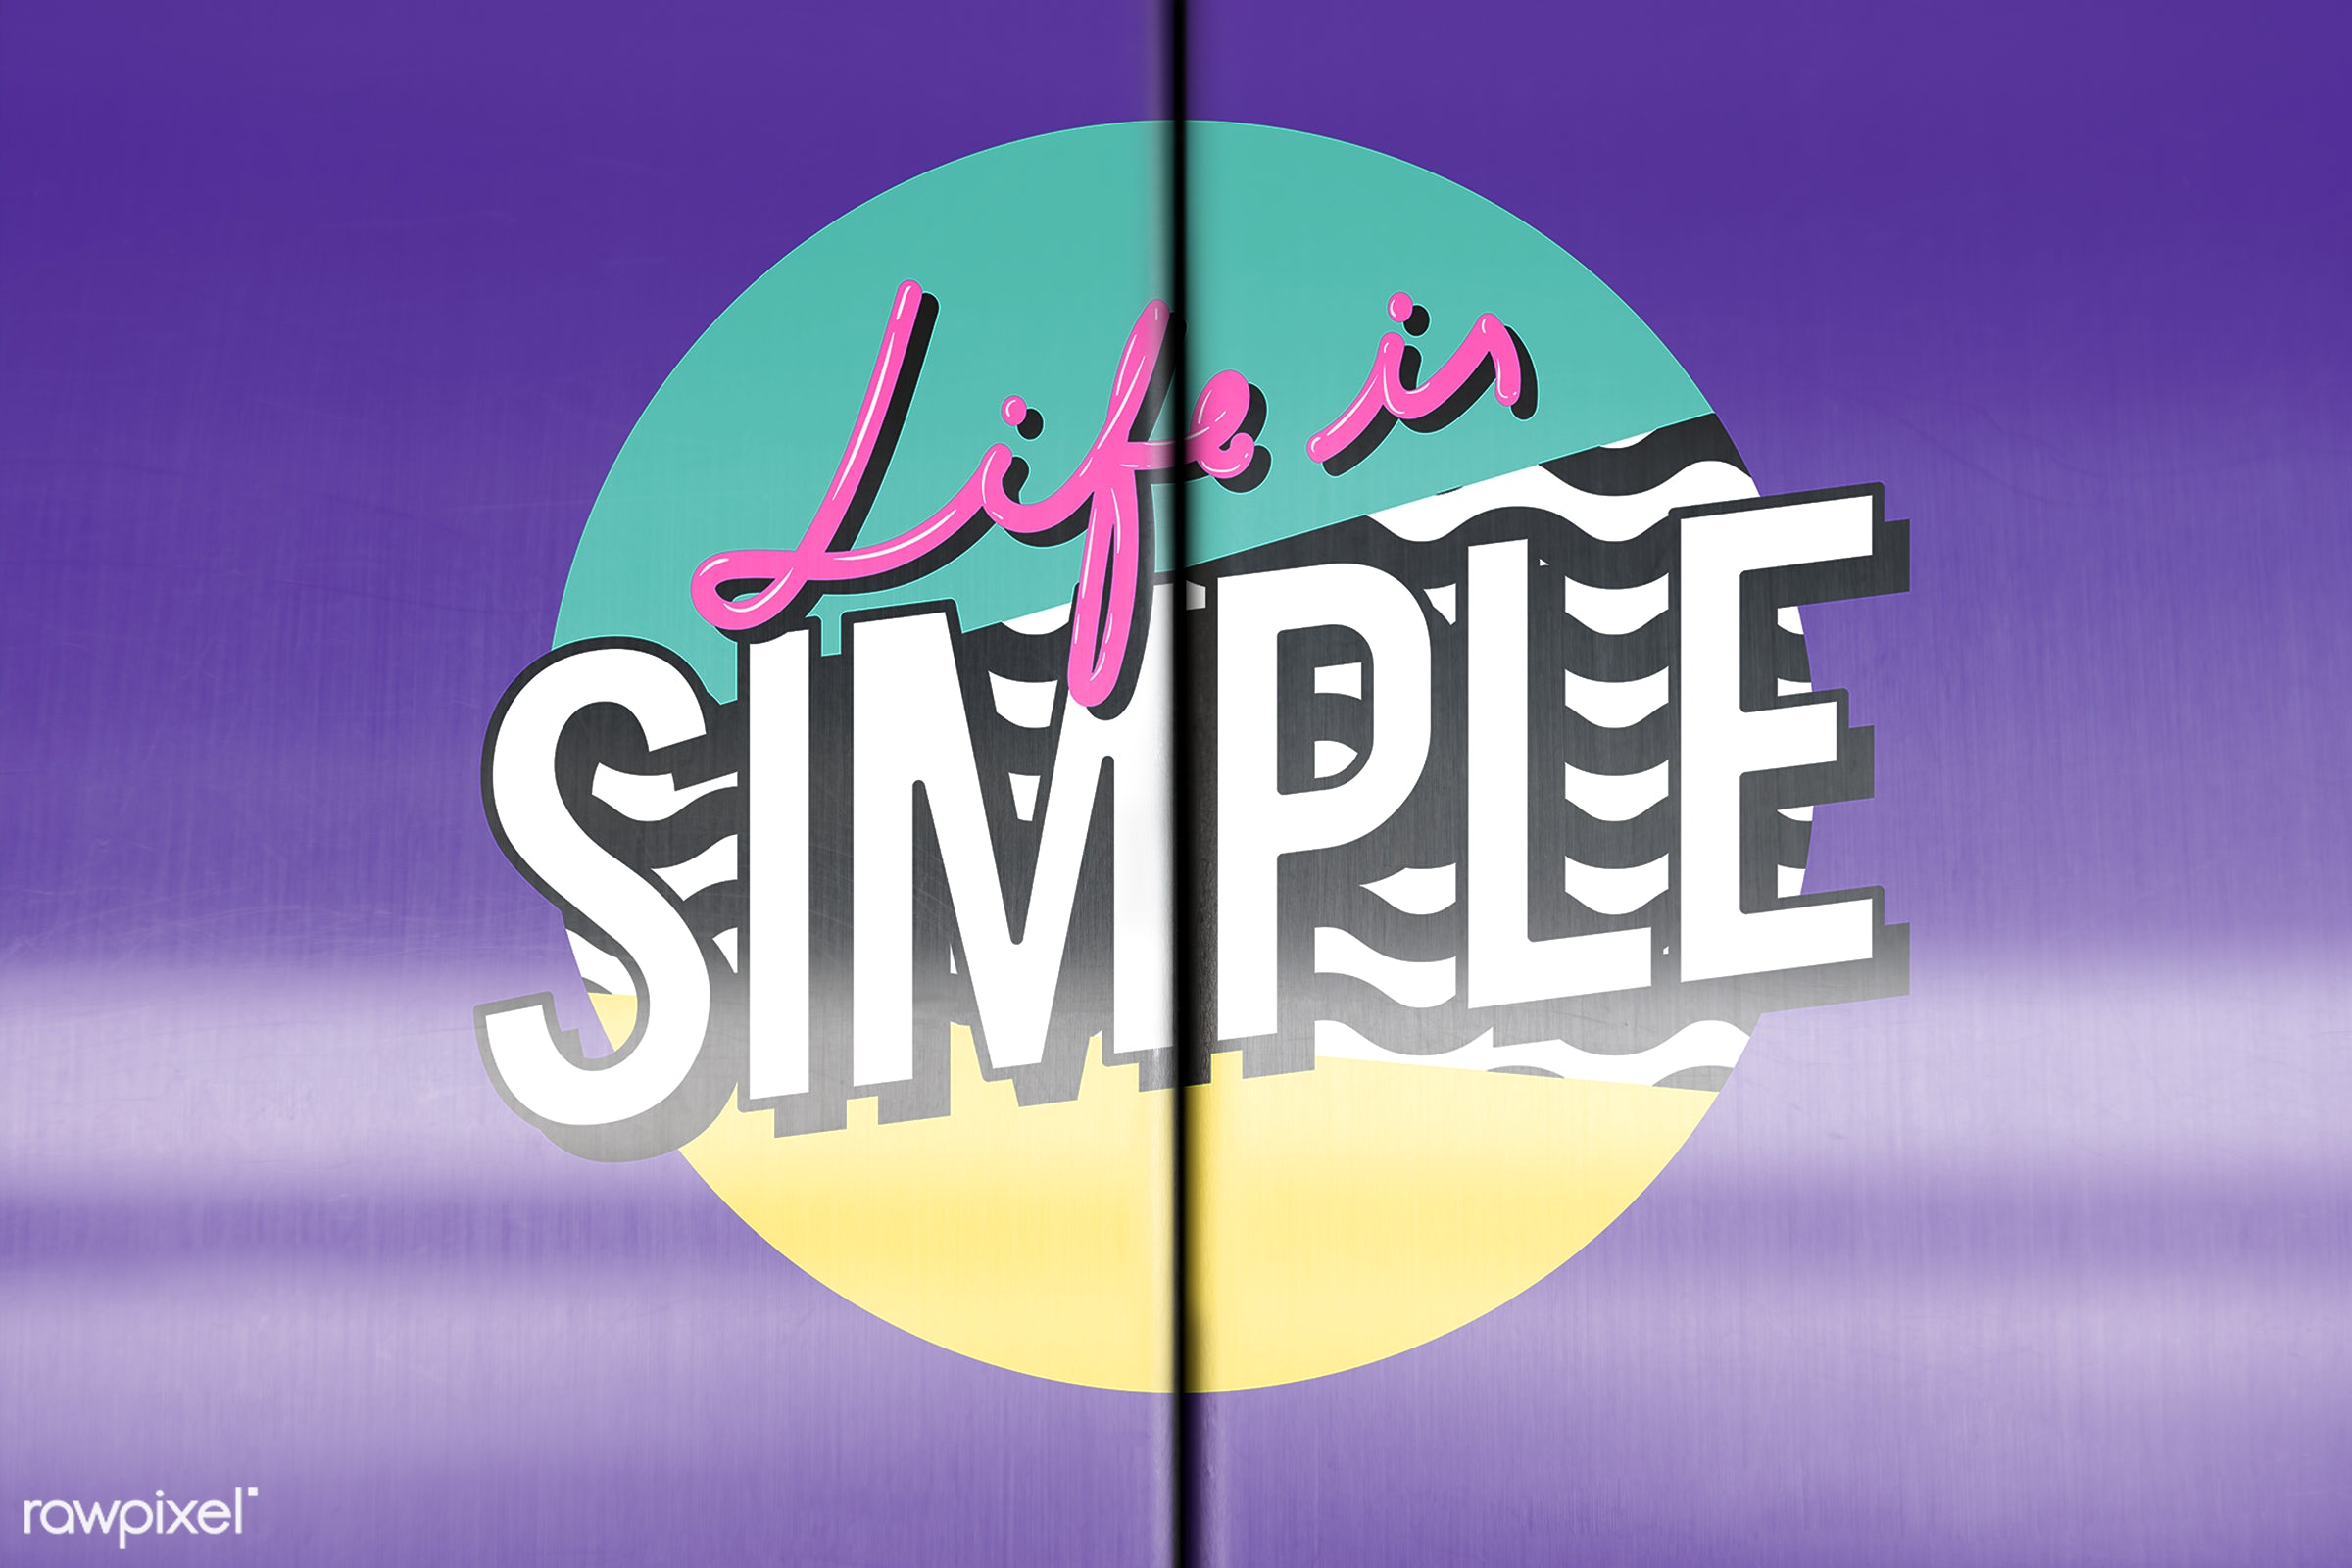 elevator, purple, close, copy space, design, door, life is simple, mock up, mockup, phrase, simple, style